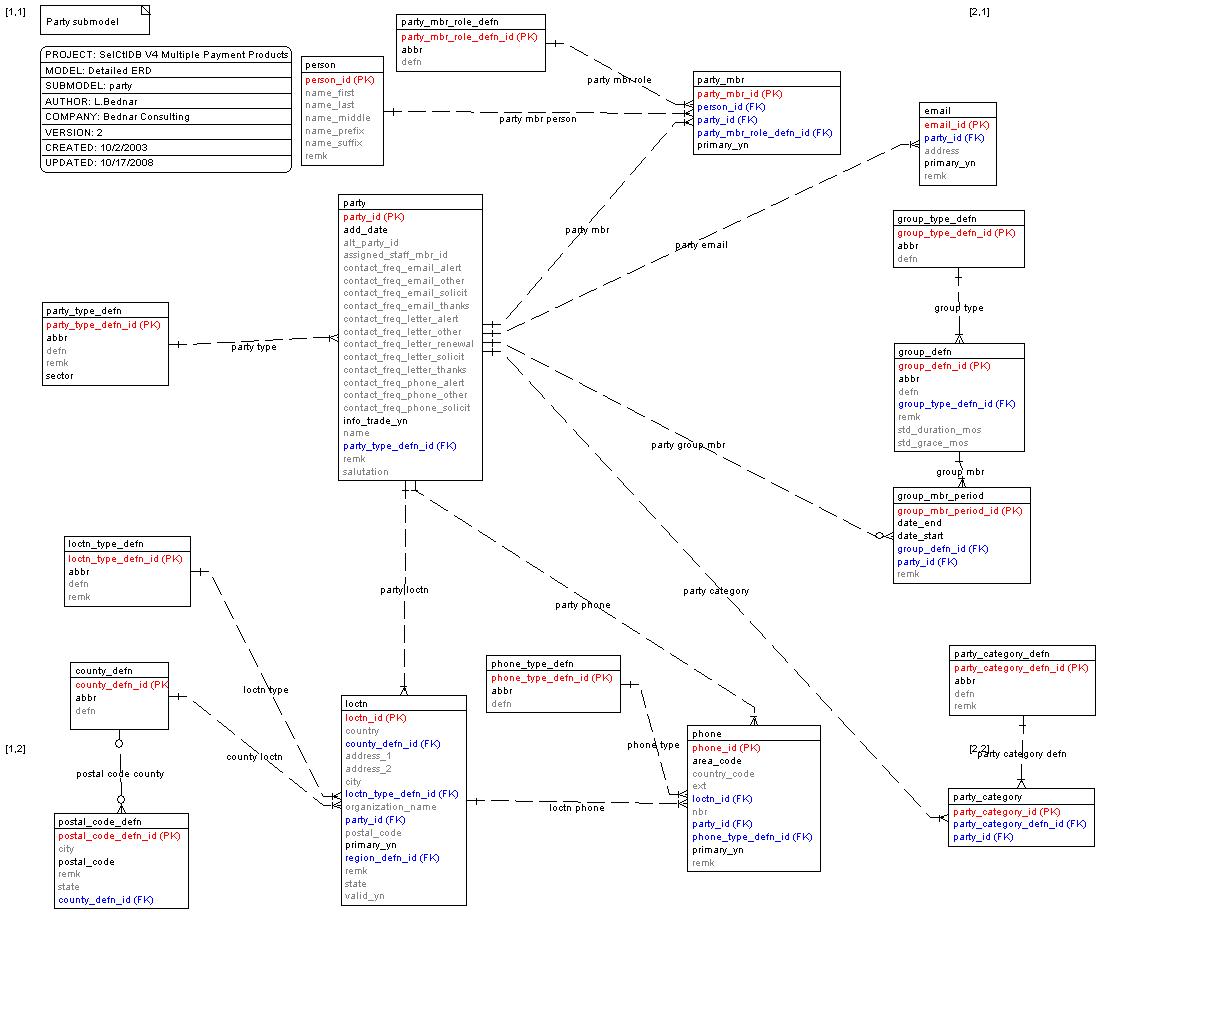 data model entity relationship diagram 97 chevy s10 stereo wiring selctldb